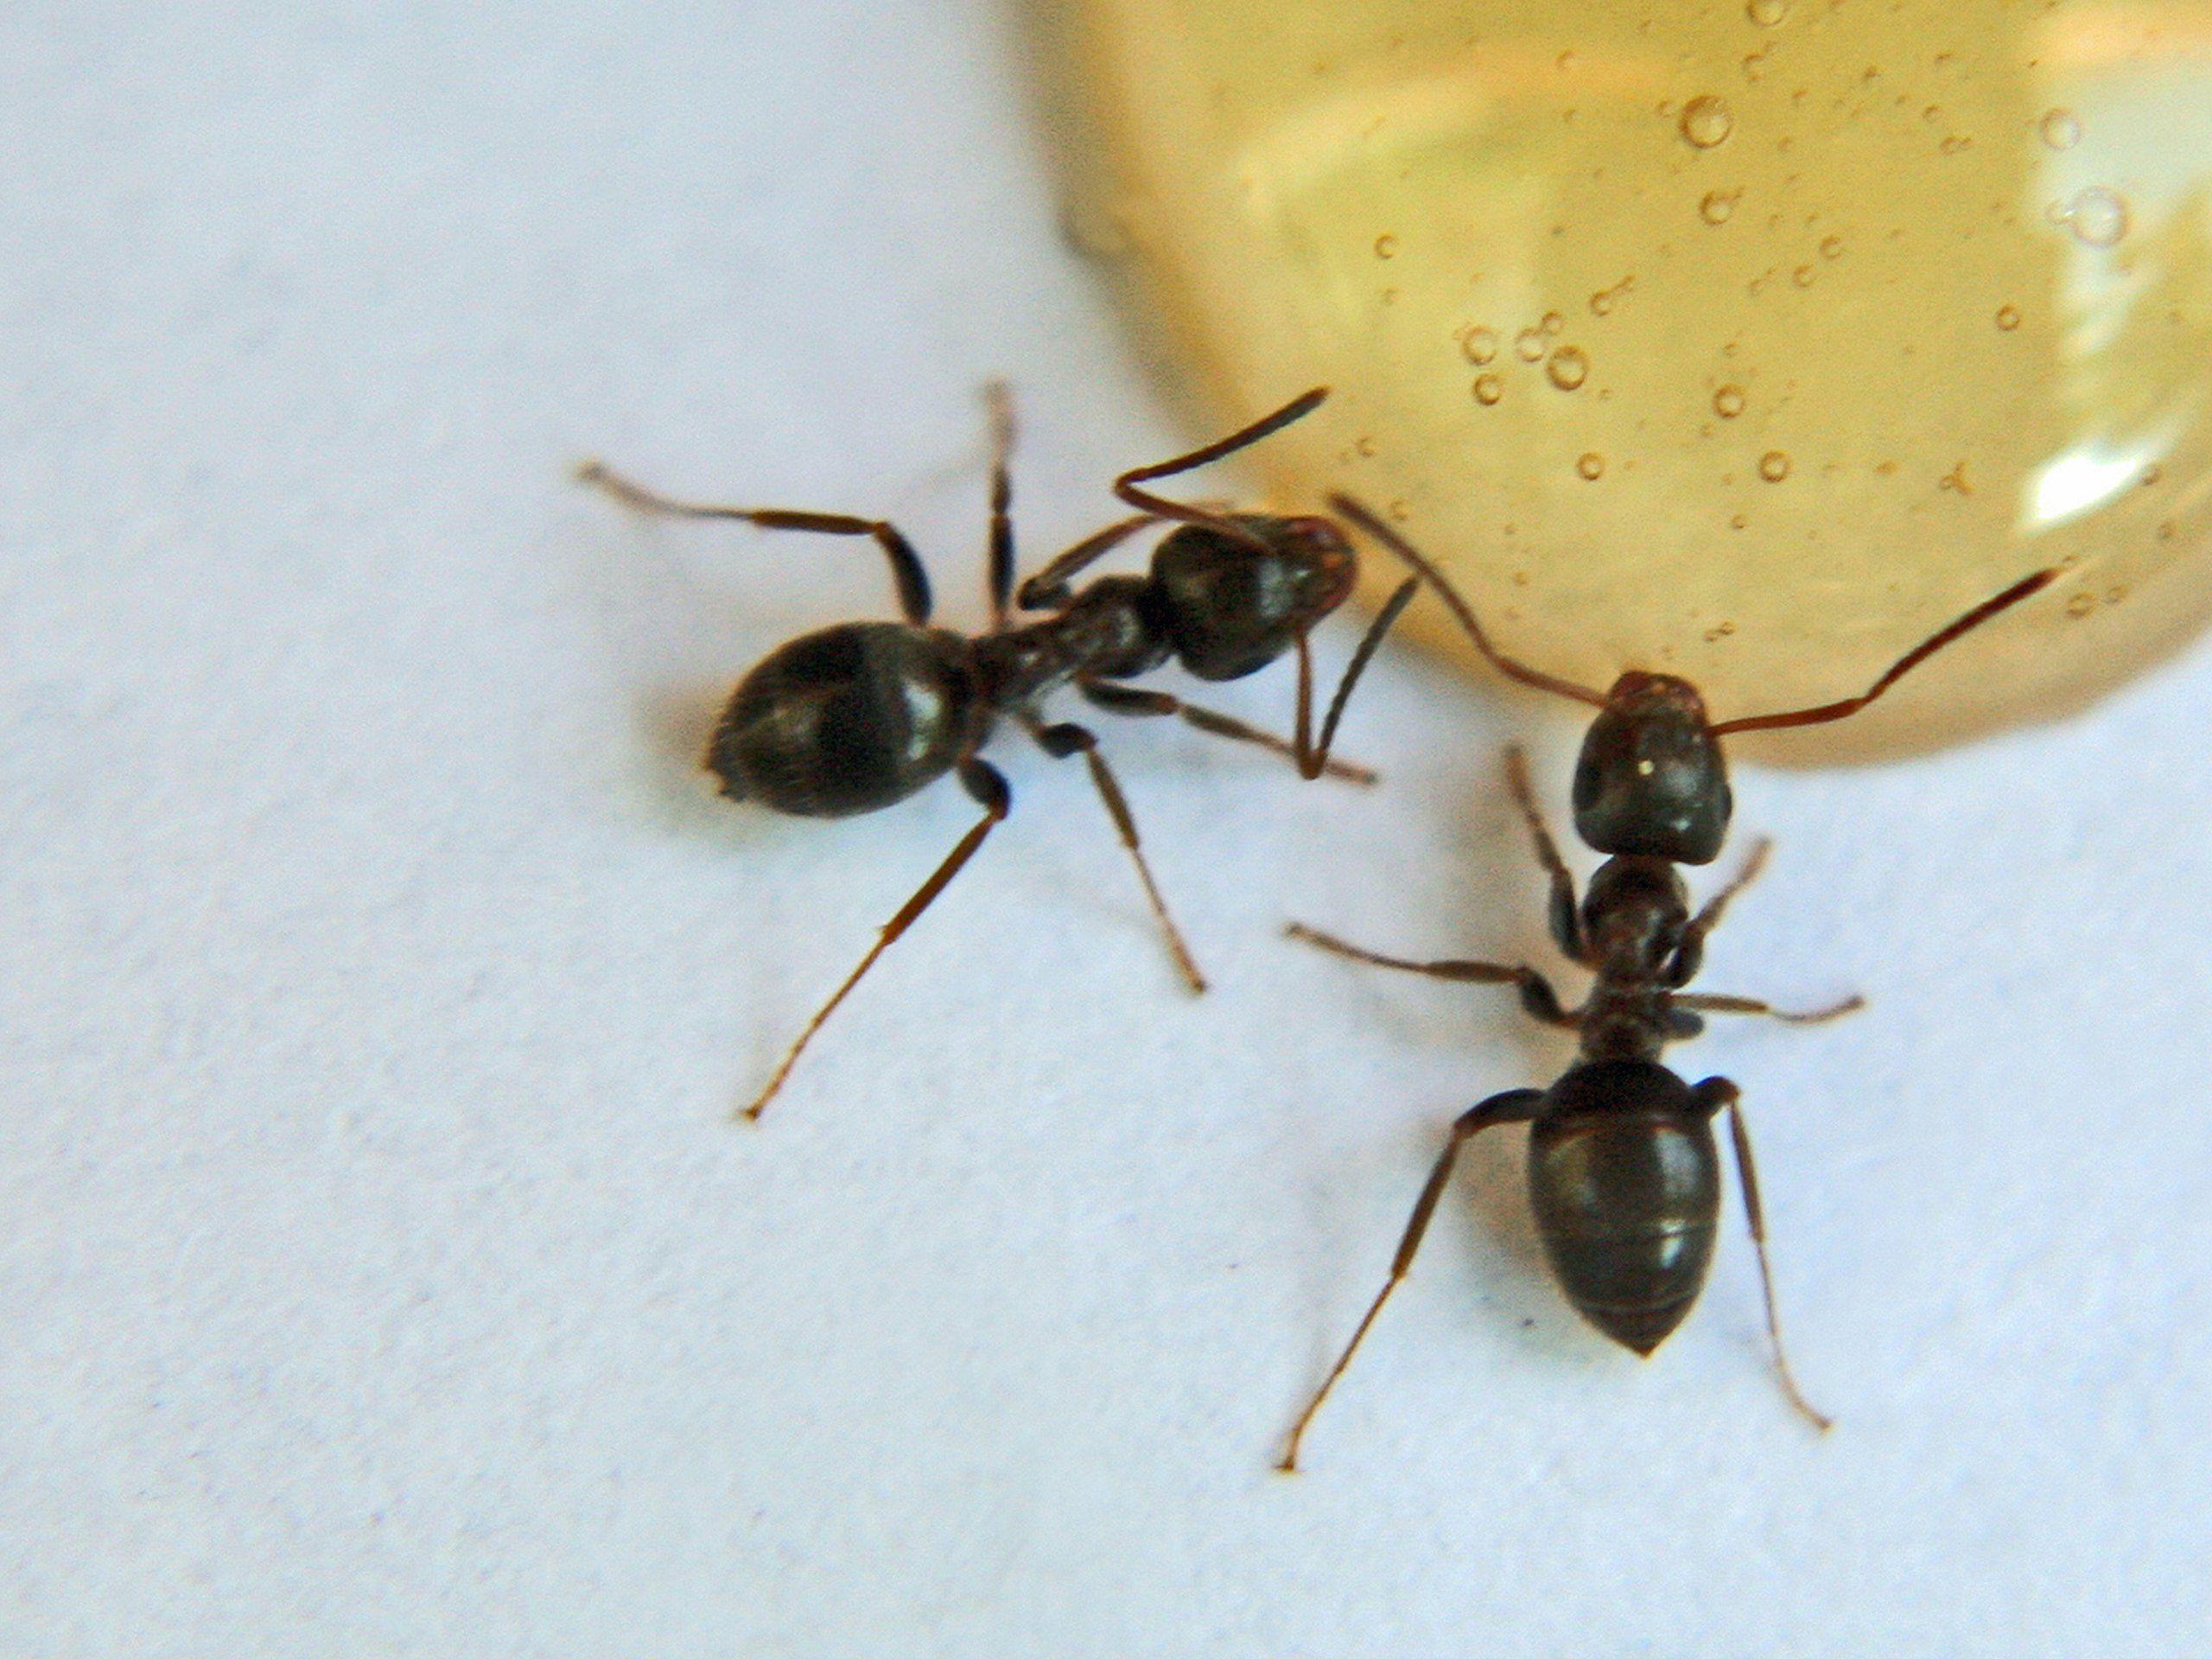 best ways to get rid of sugar ants | lake ideas | sugar ants